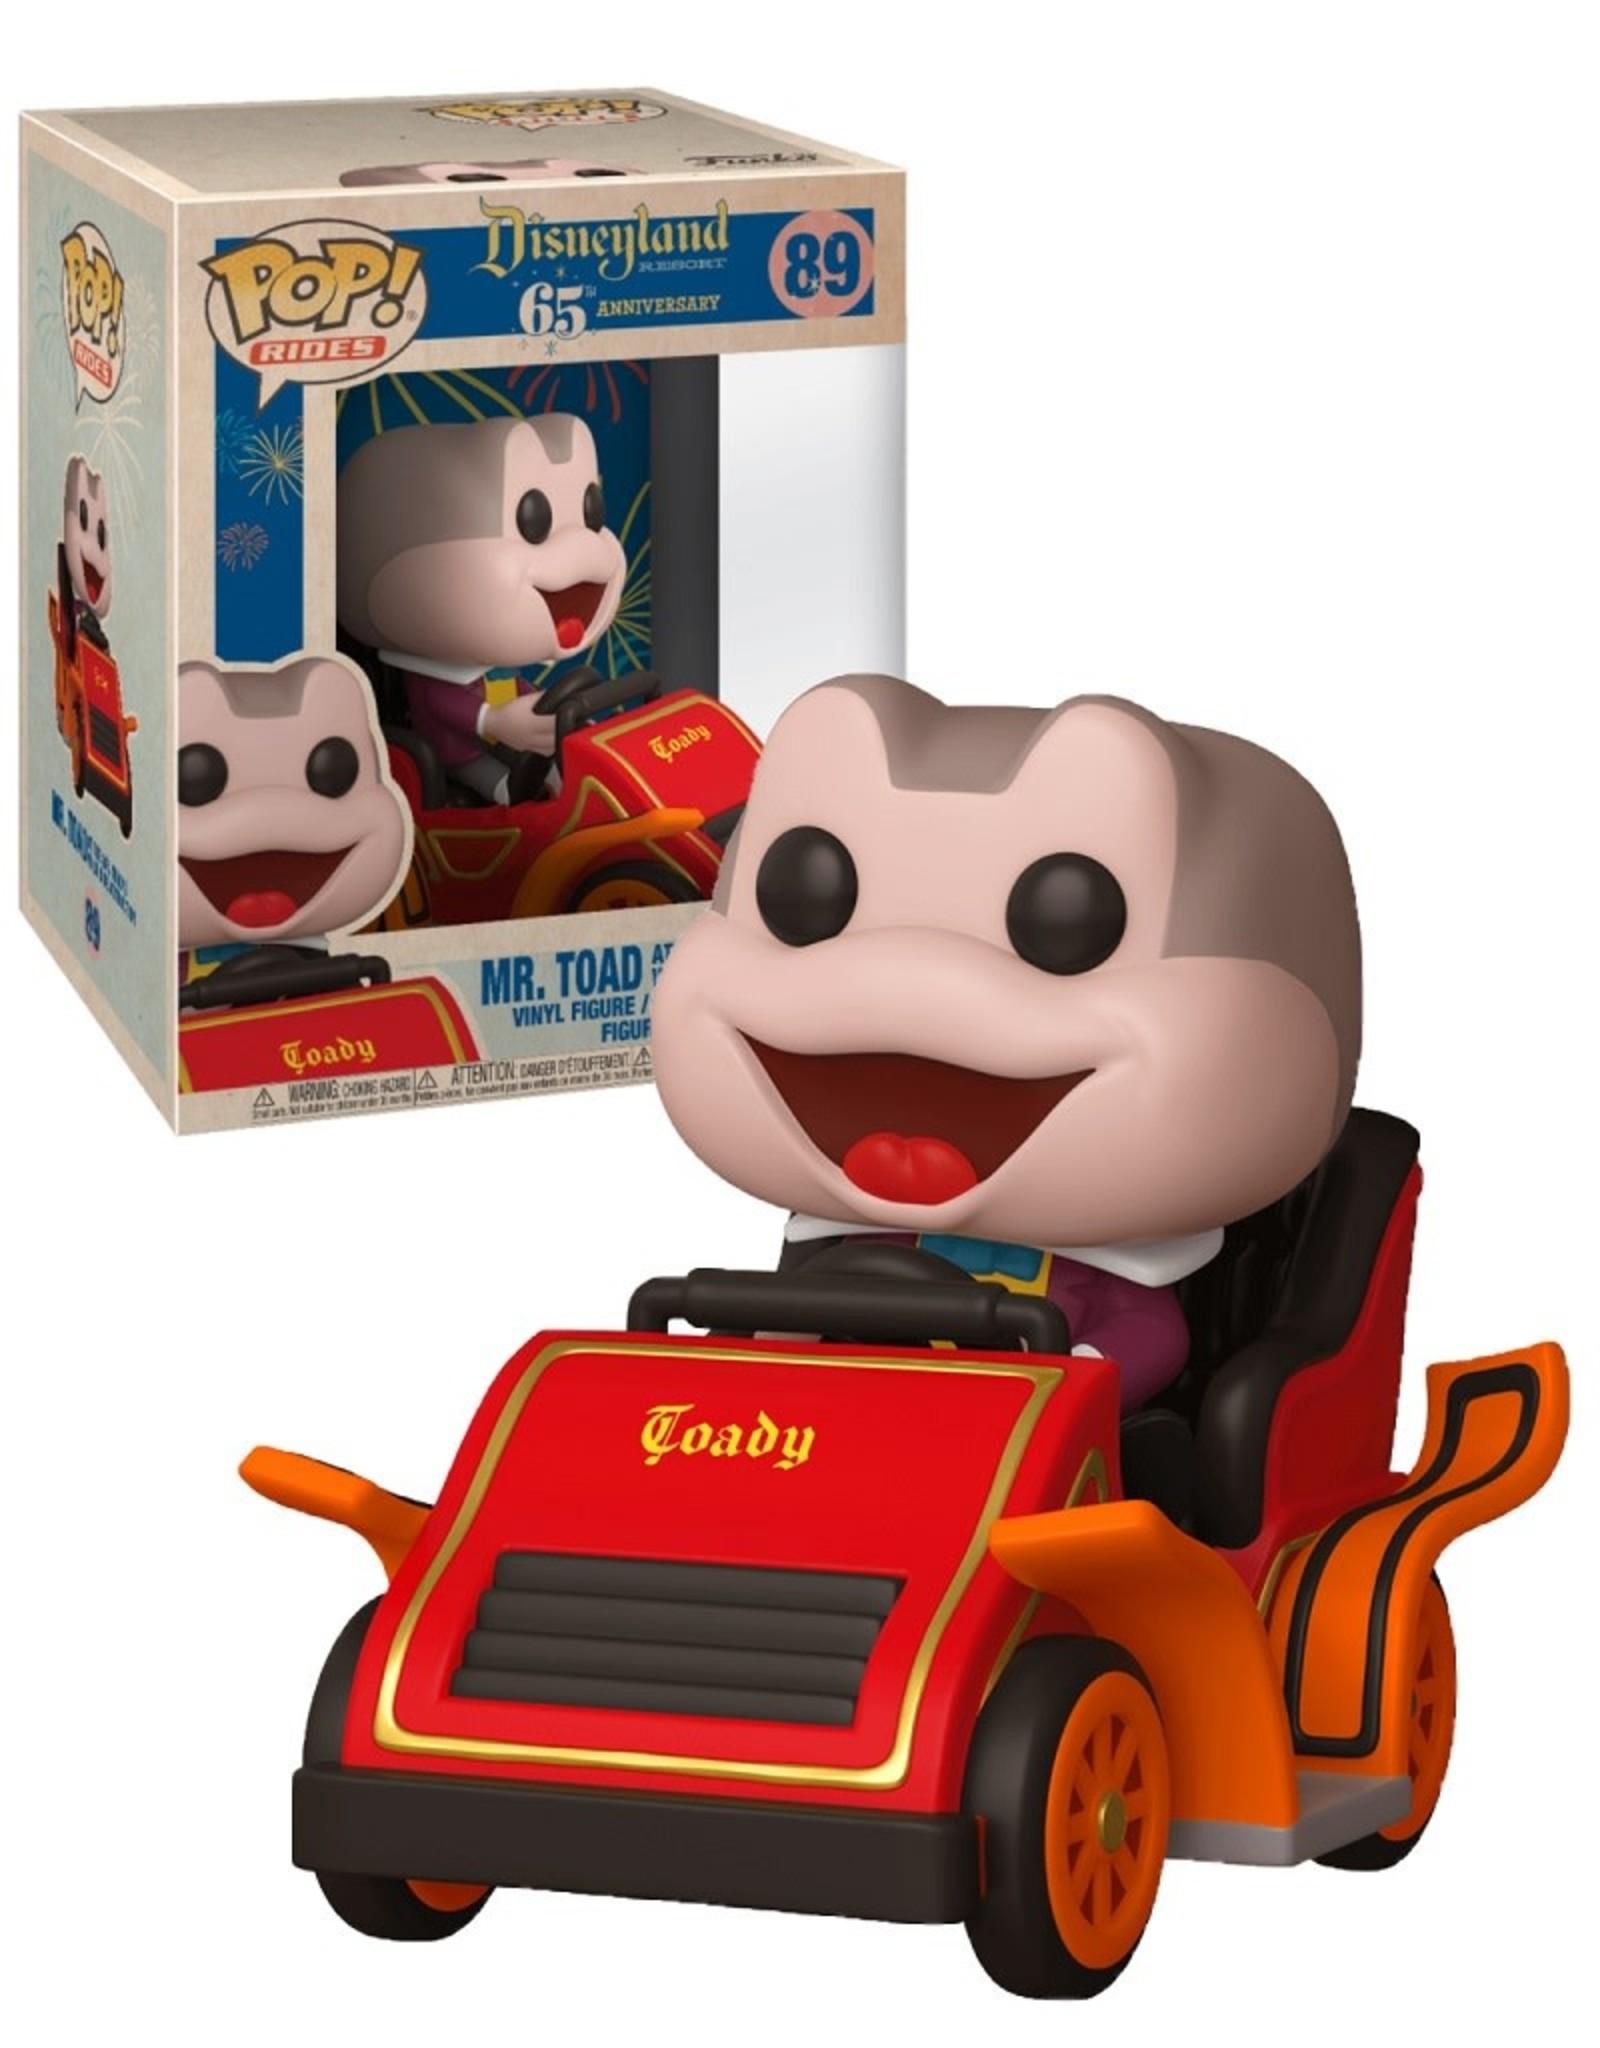 Disneyland 89 ( Funko Pop ) Mr. Toad Ride attraction